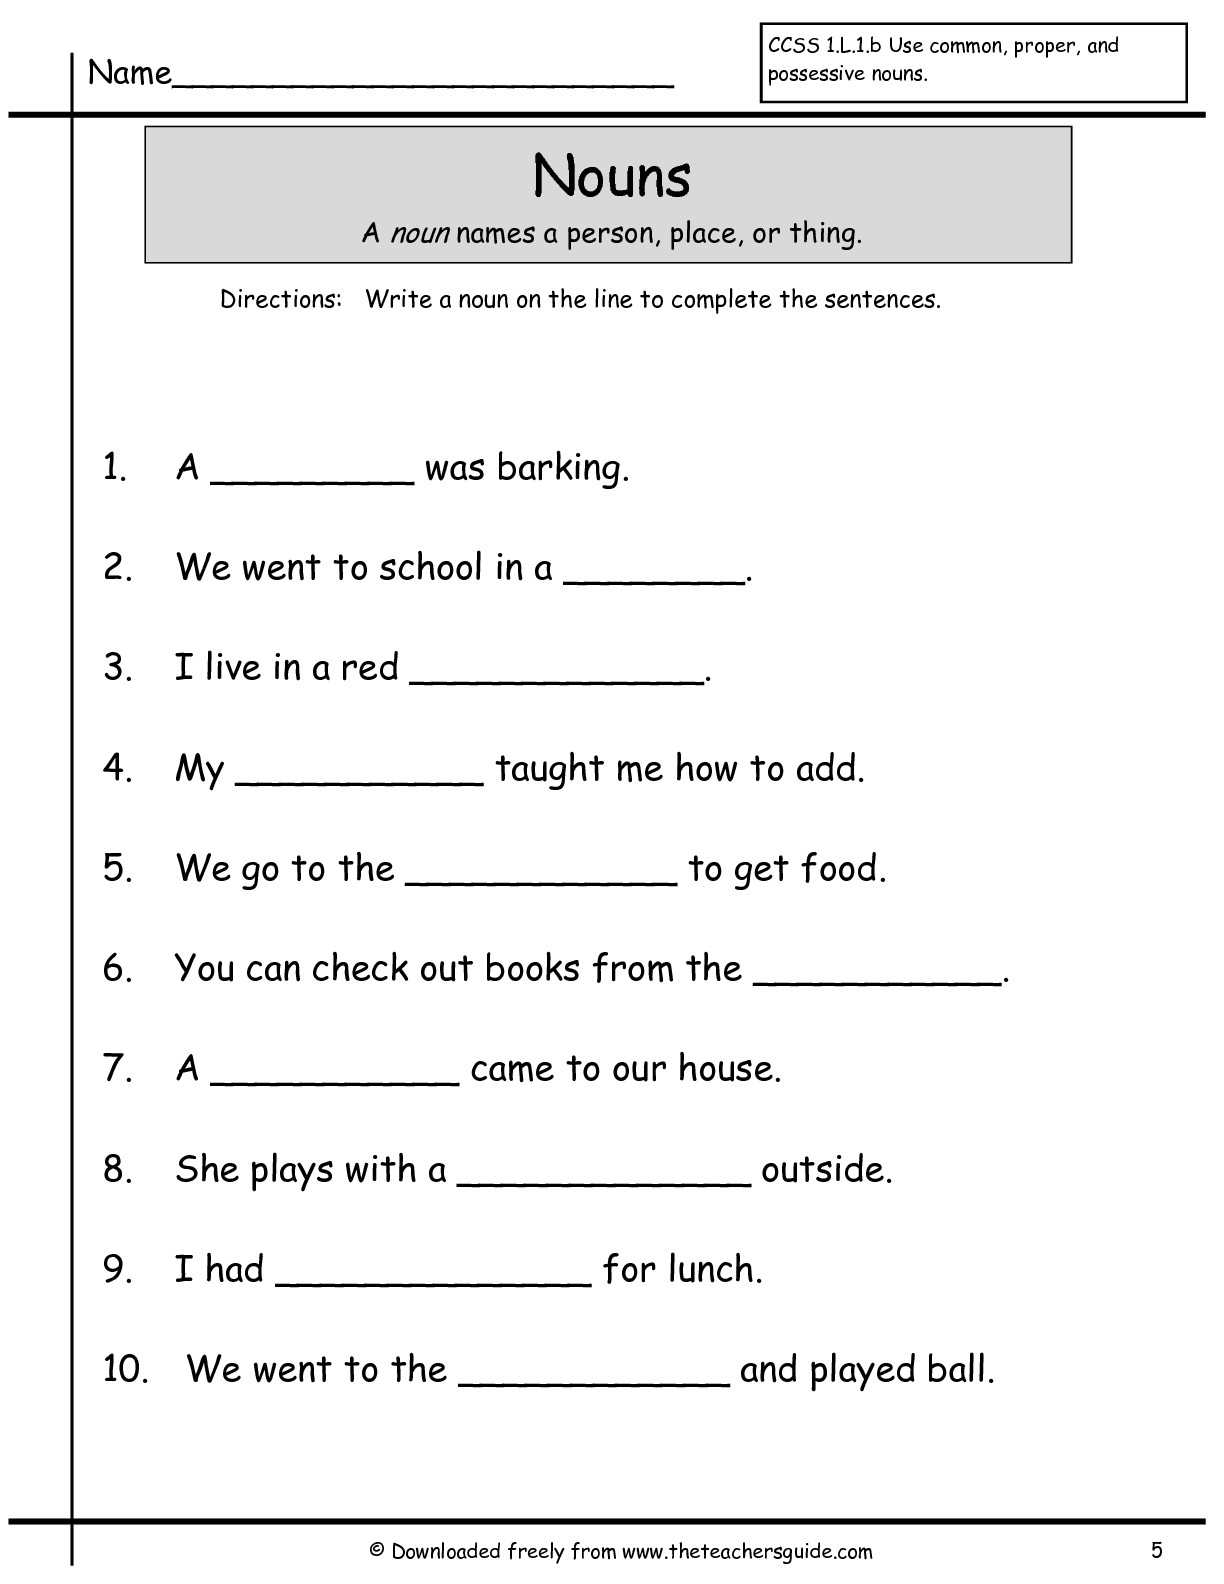 Printables. Social Studies For 1St Grade Worksheets - Social Studies Worksheets First Grade Free Printable